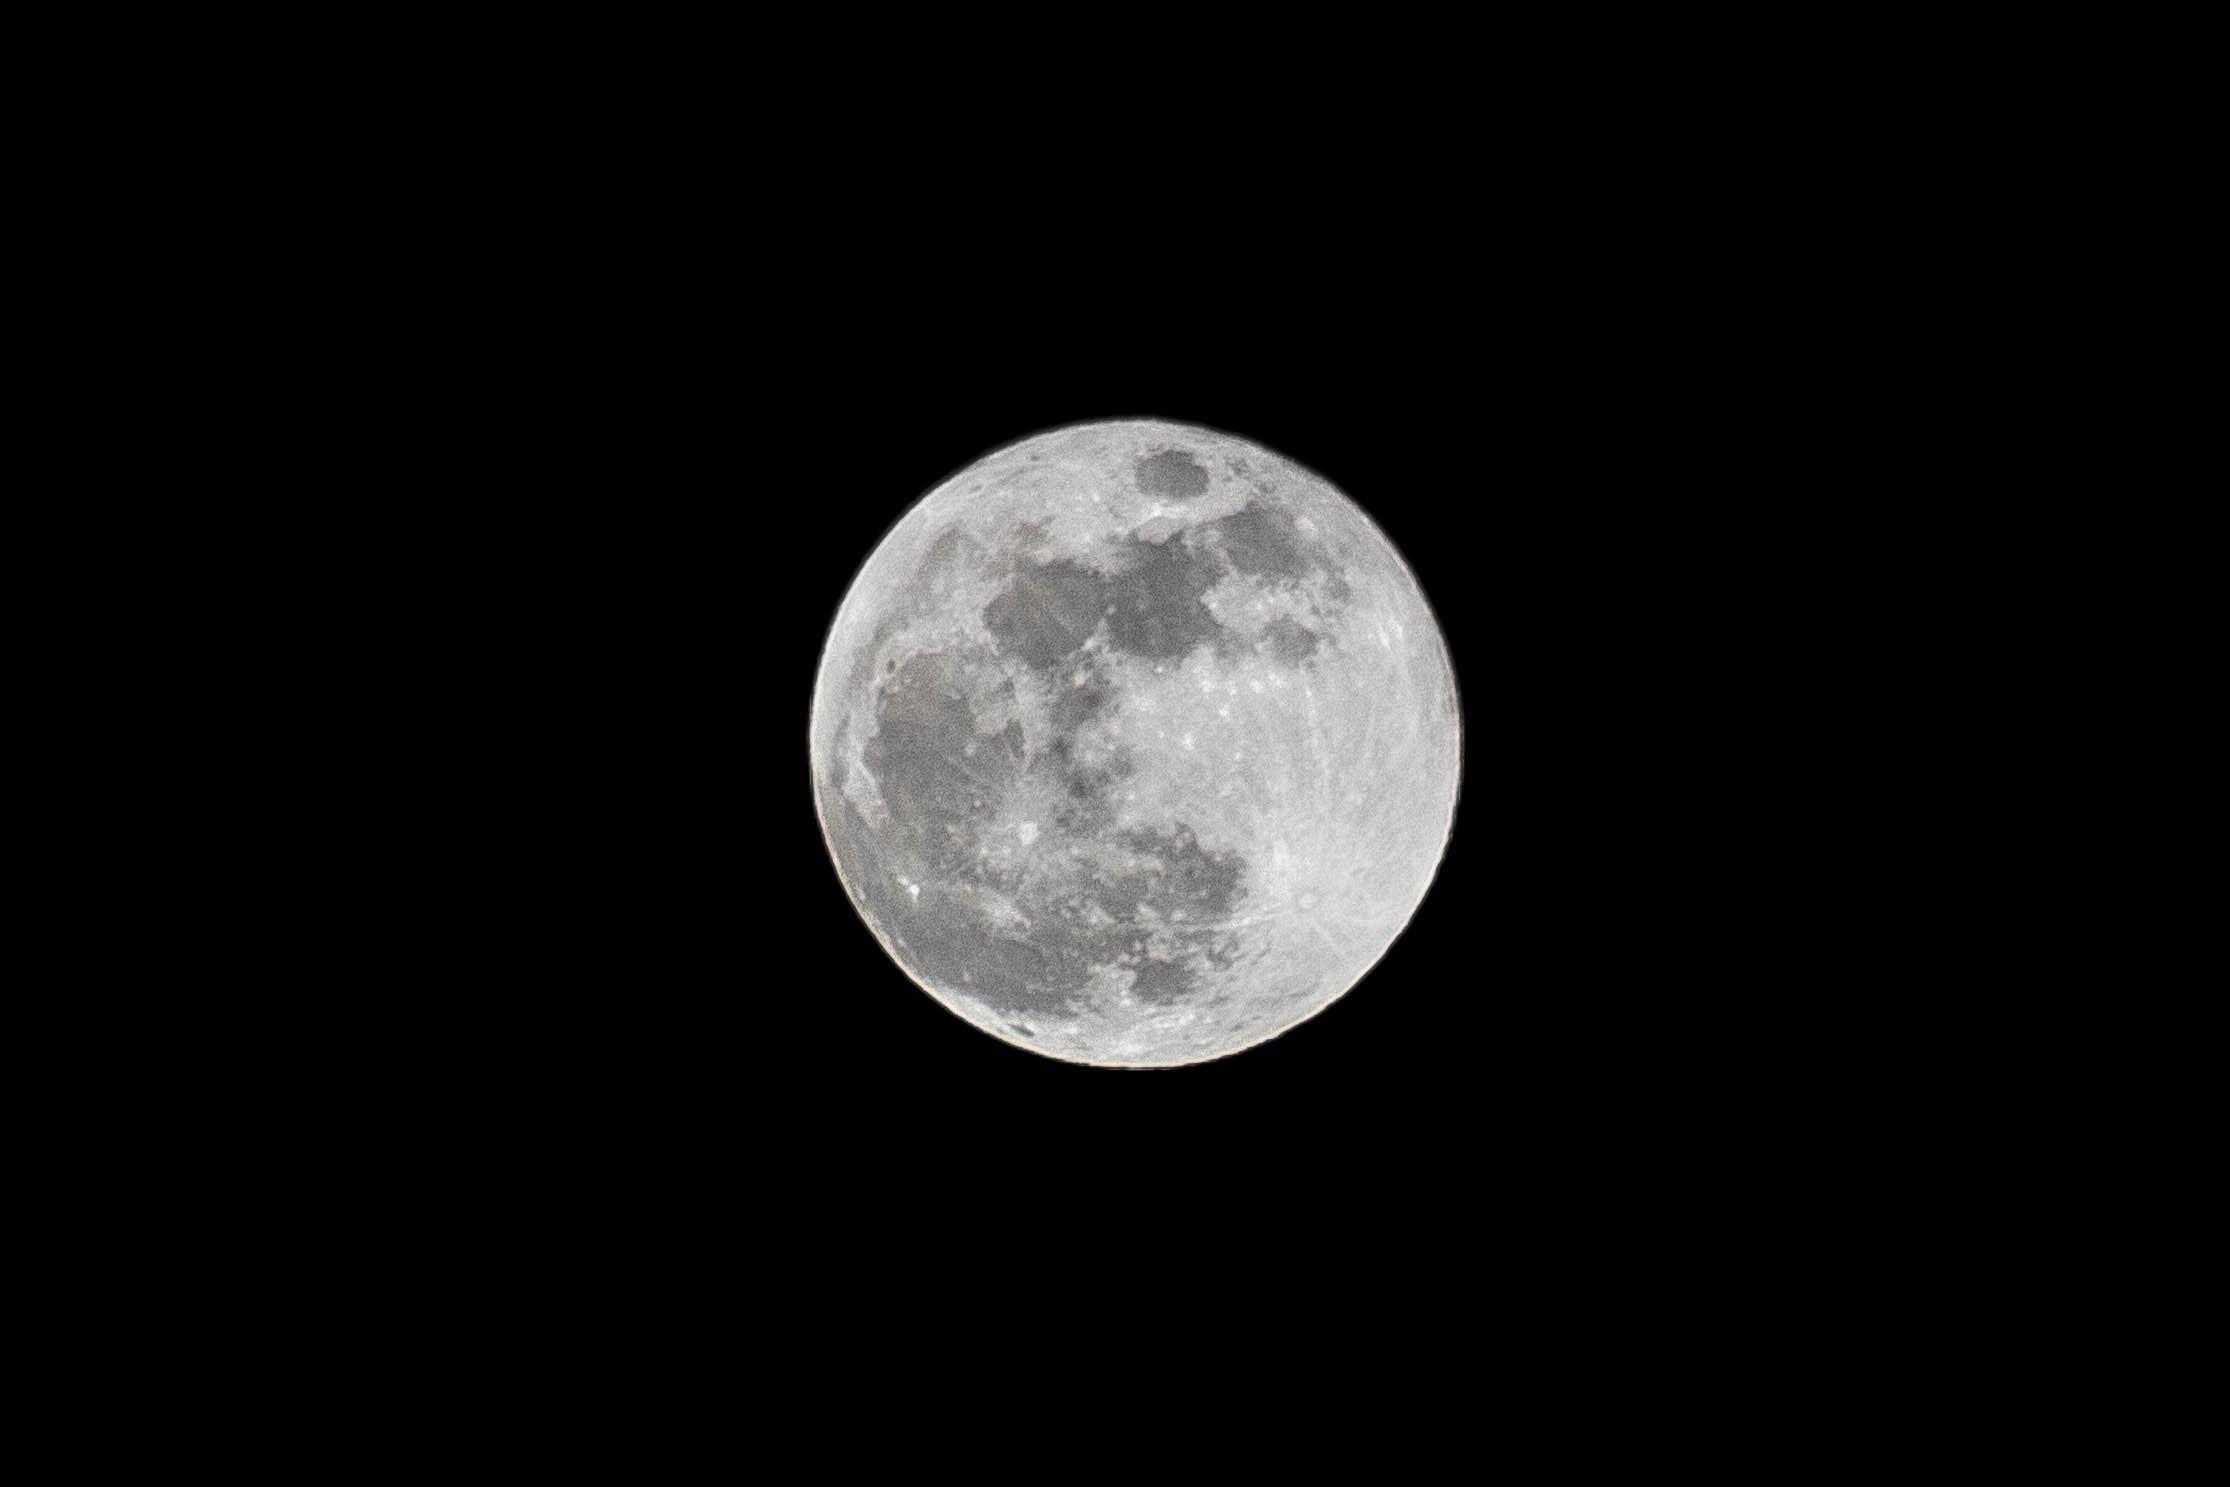 photograph of full moon